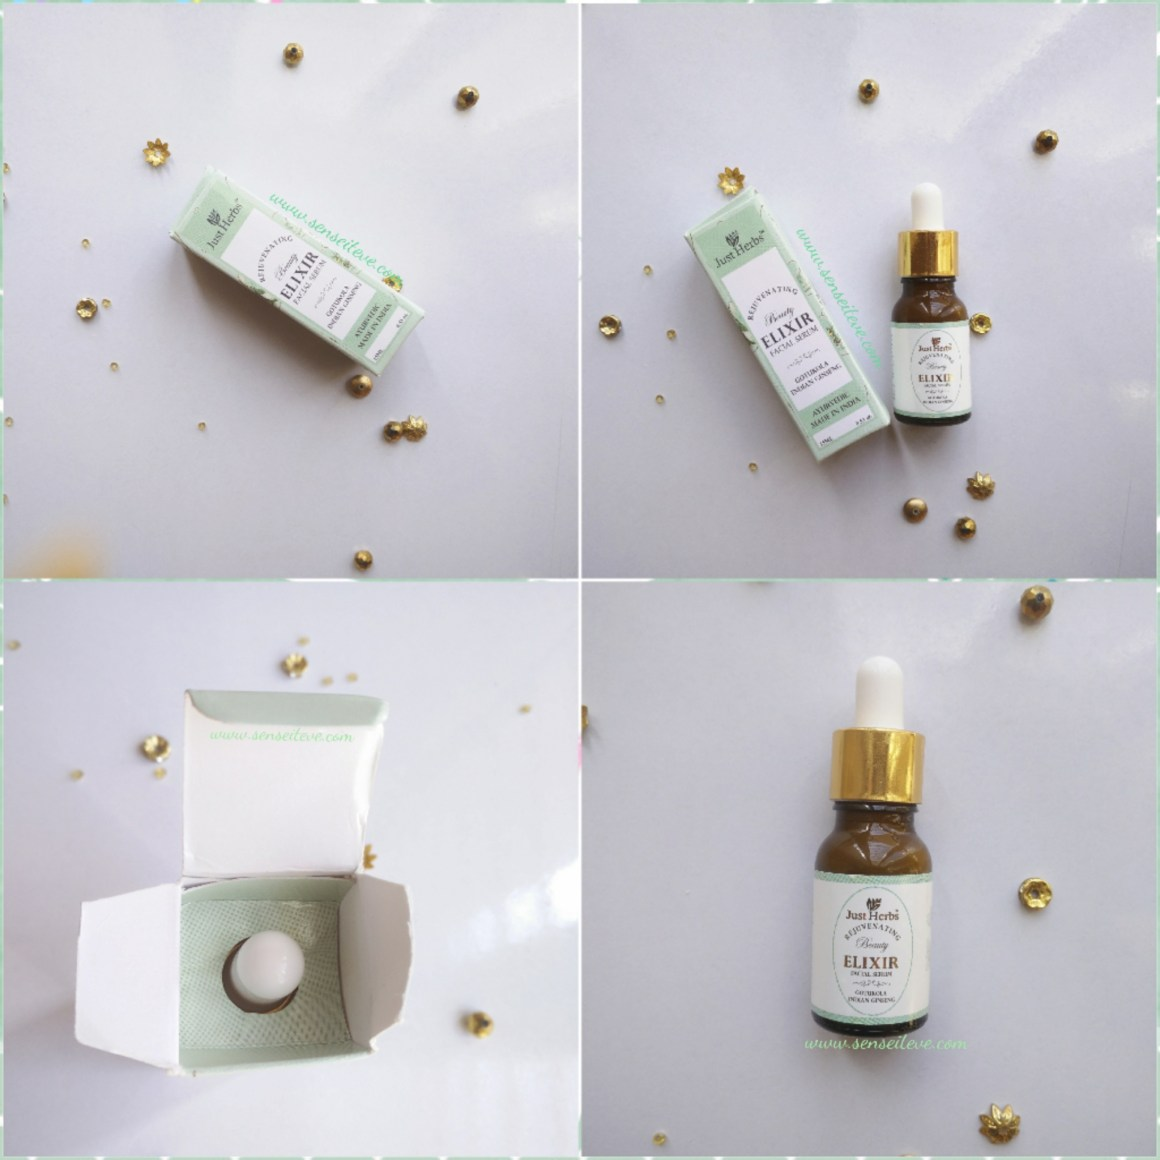 Just Herbs Rejuvenating Beauty Elixir Facial Serum Packaging